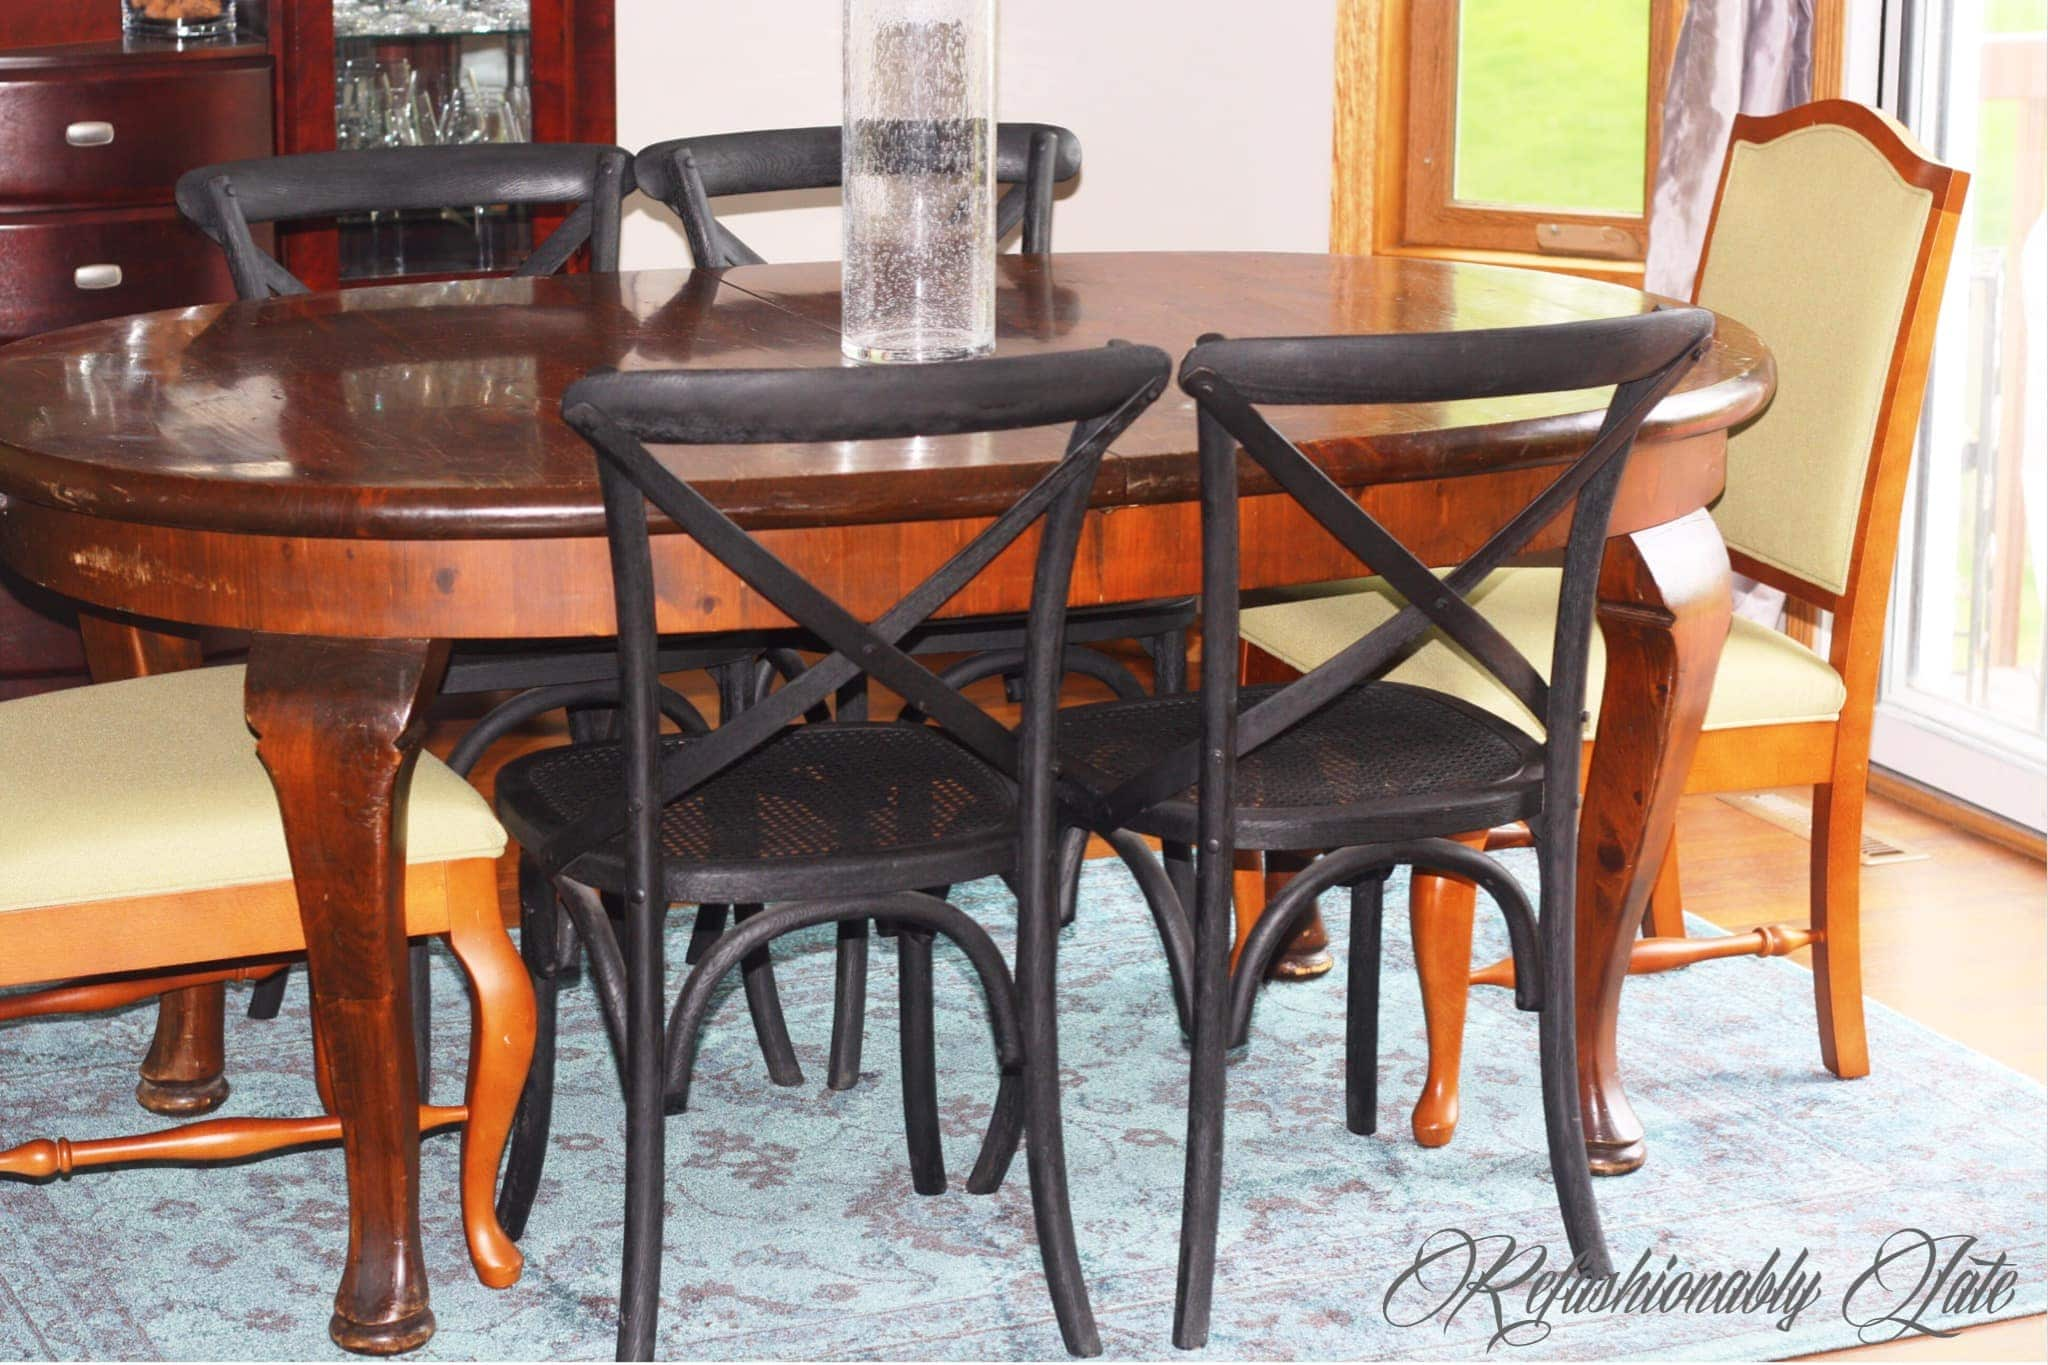 Restored Restoration Hardware Chairs Refashionably Late